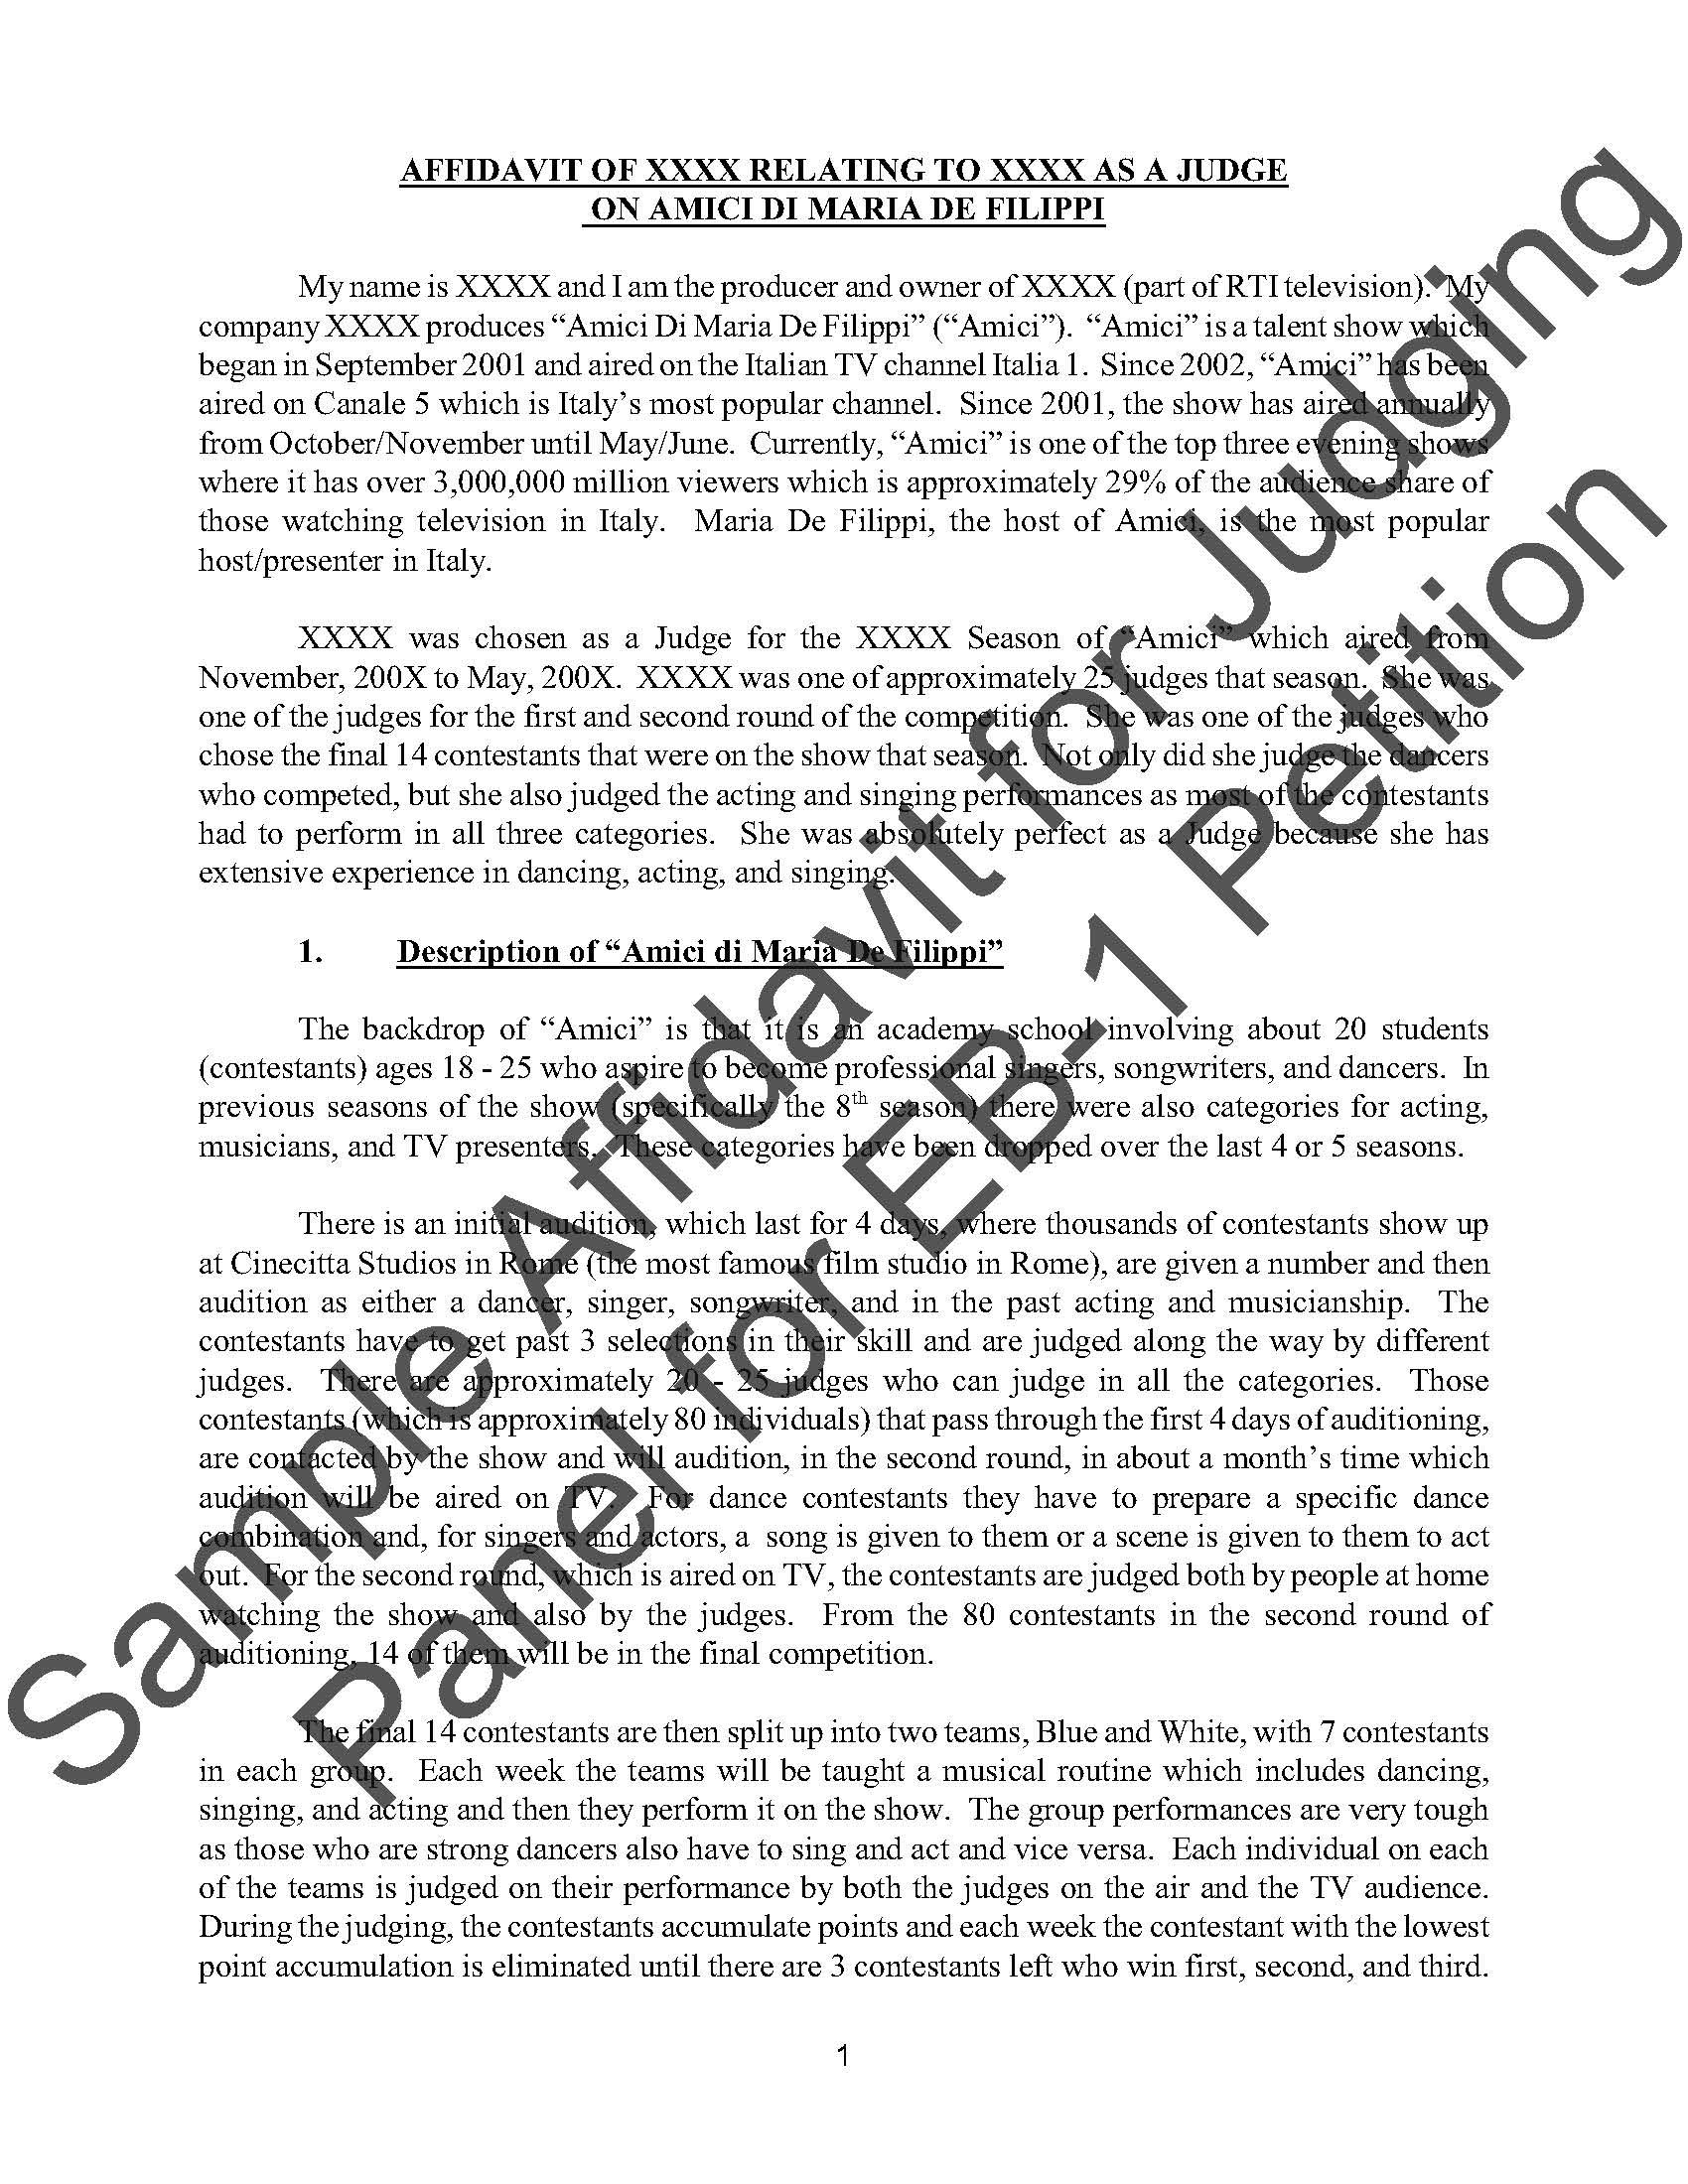 Pages from Affidavit for Judging for website.jpg